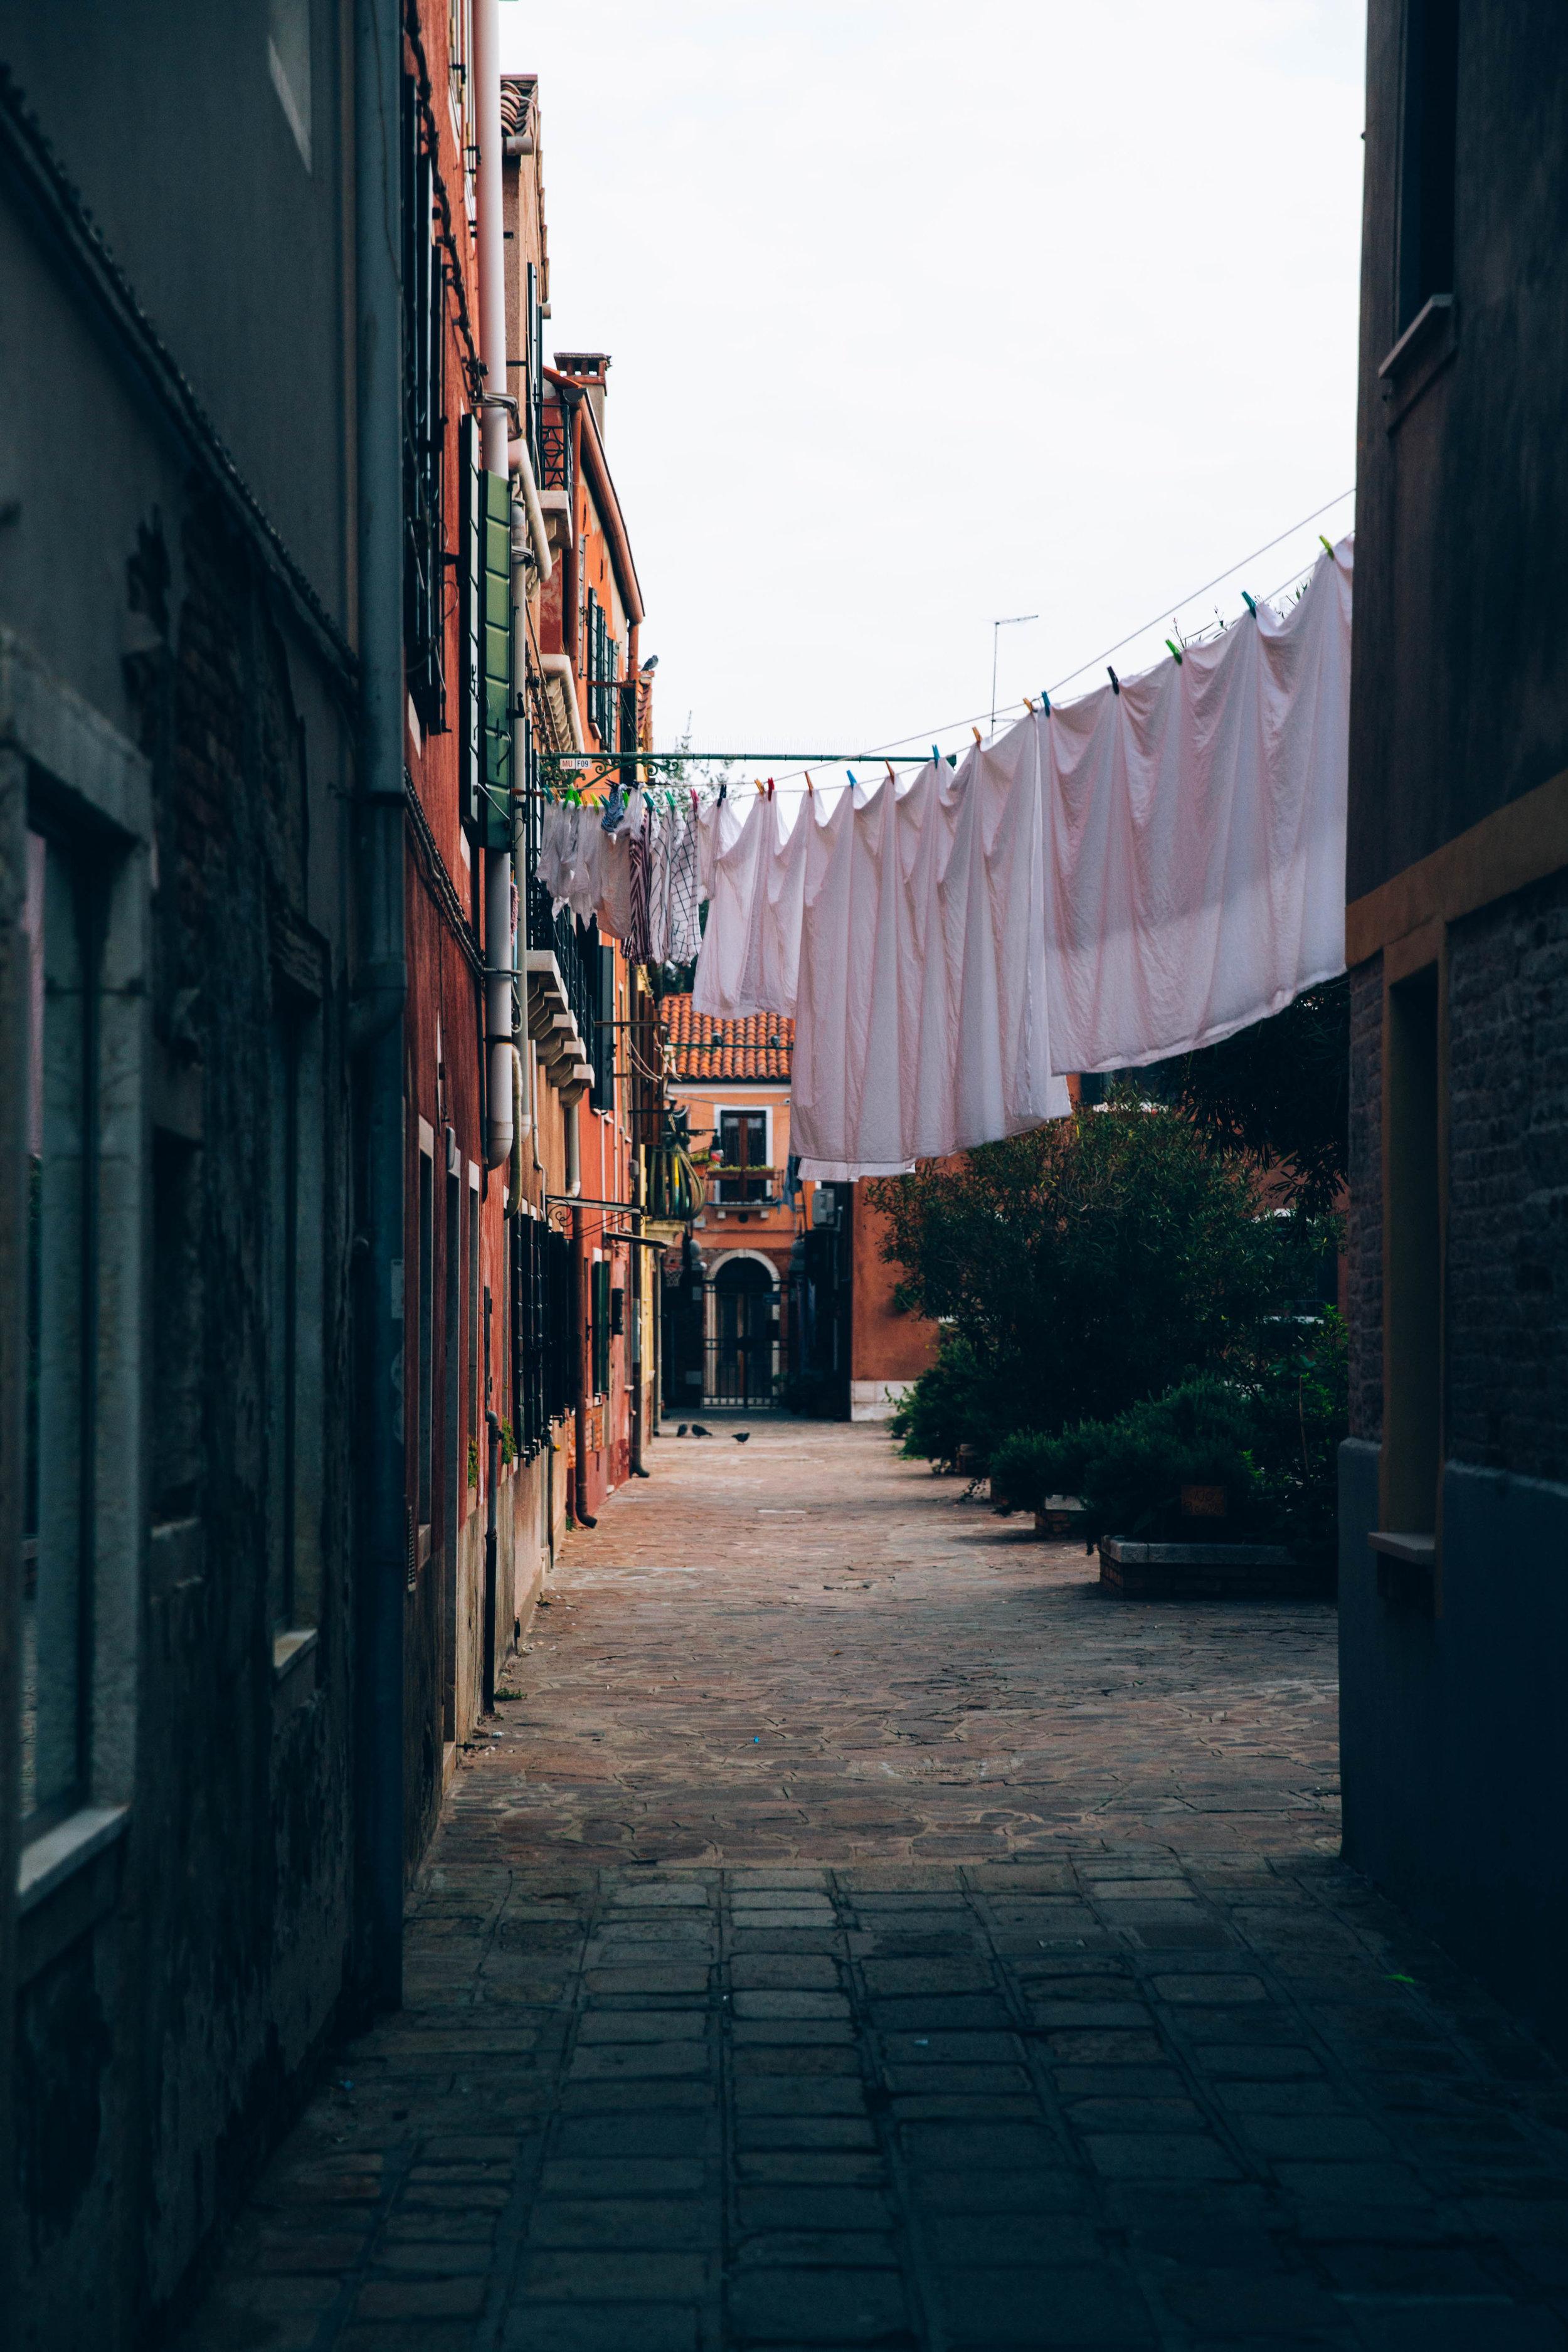 Venice-229.jpg